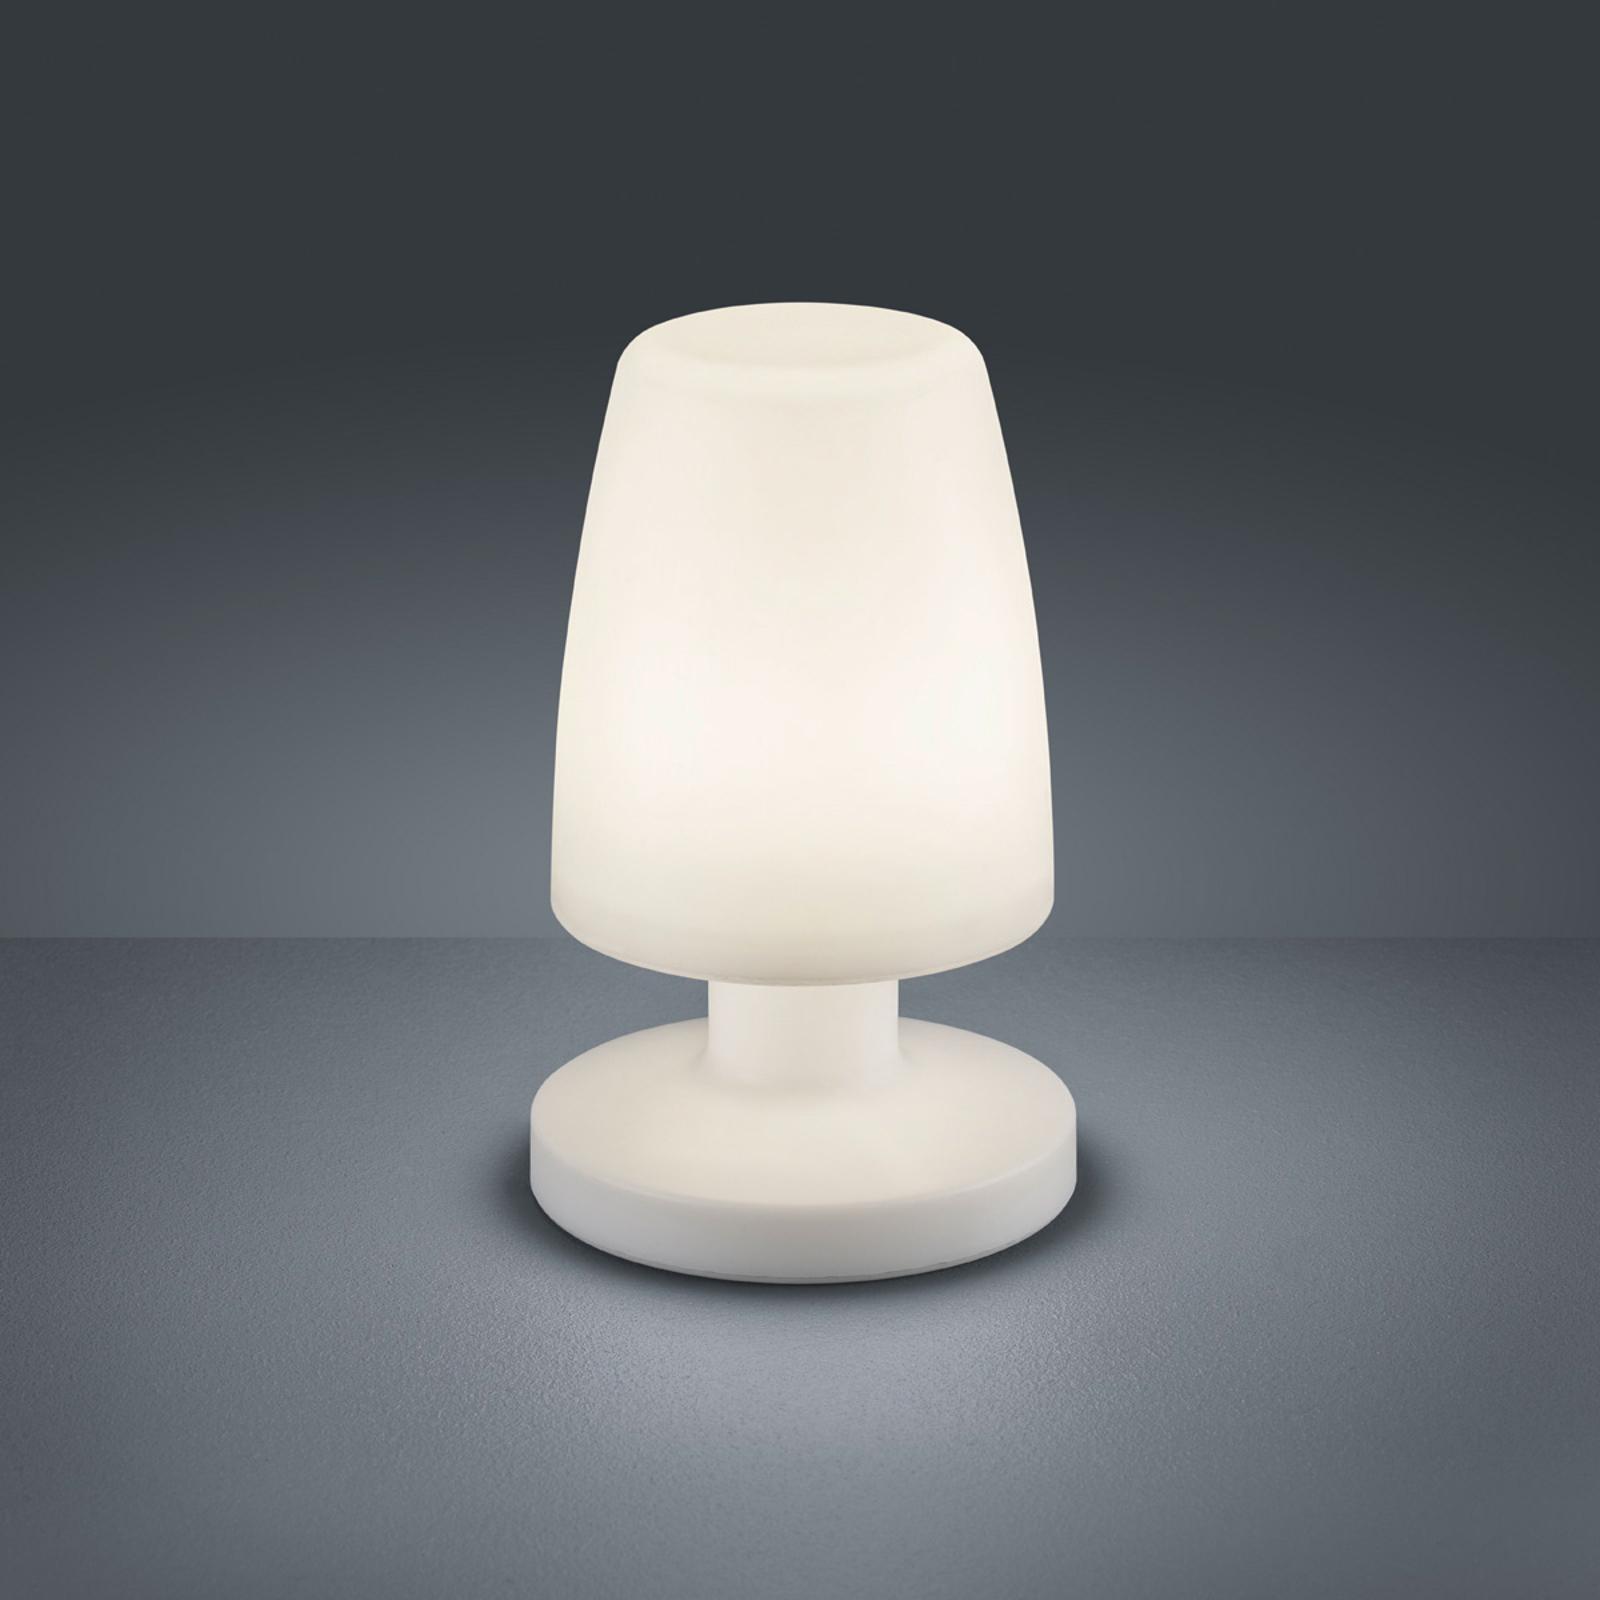 LED-bordlampe Dora, batteridrevet, til udendørs